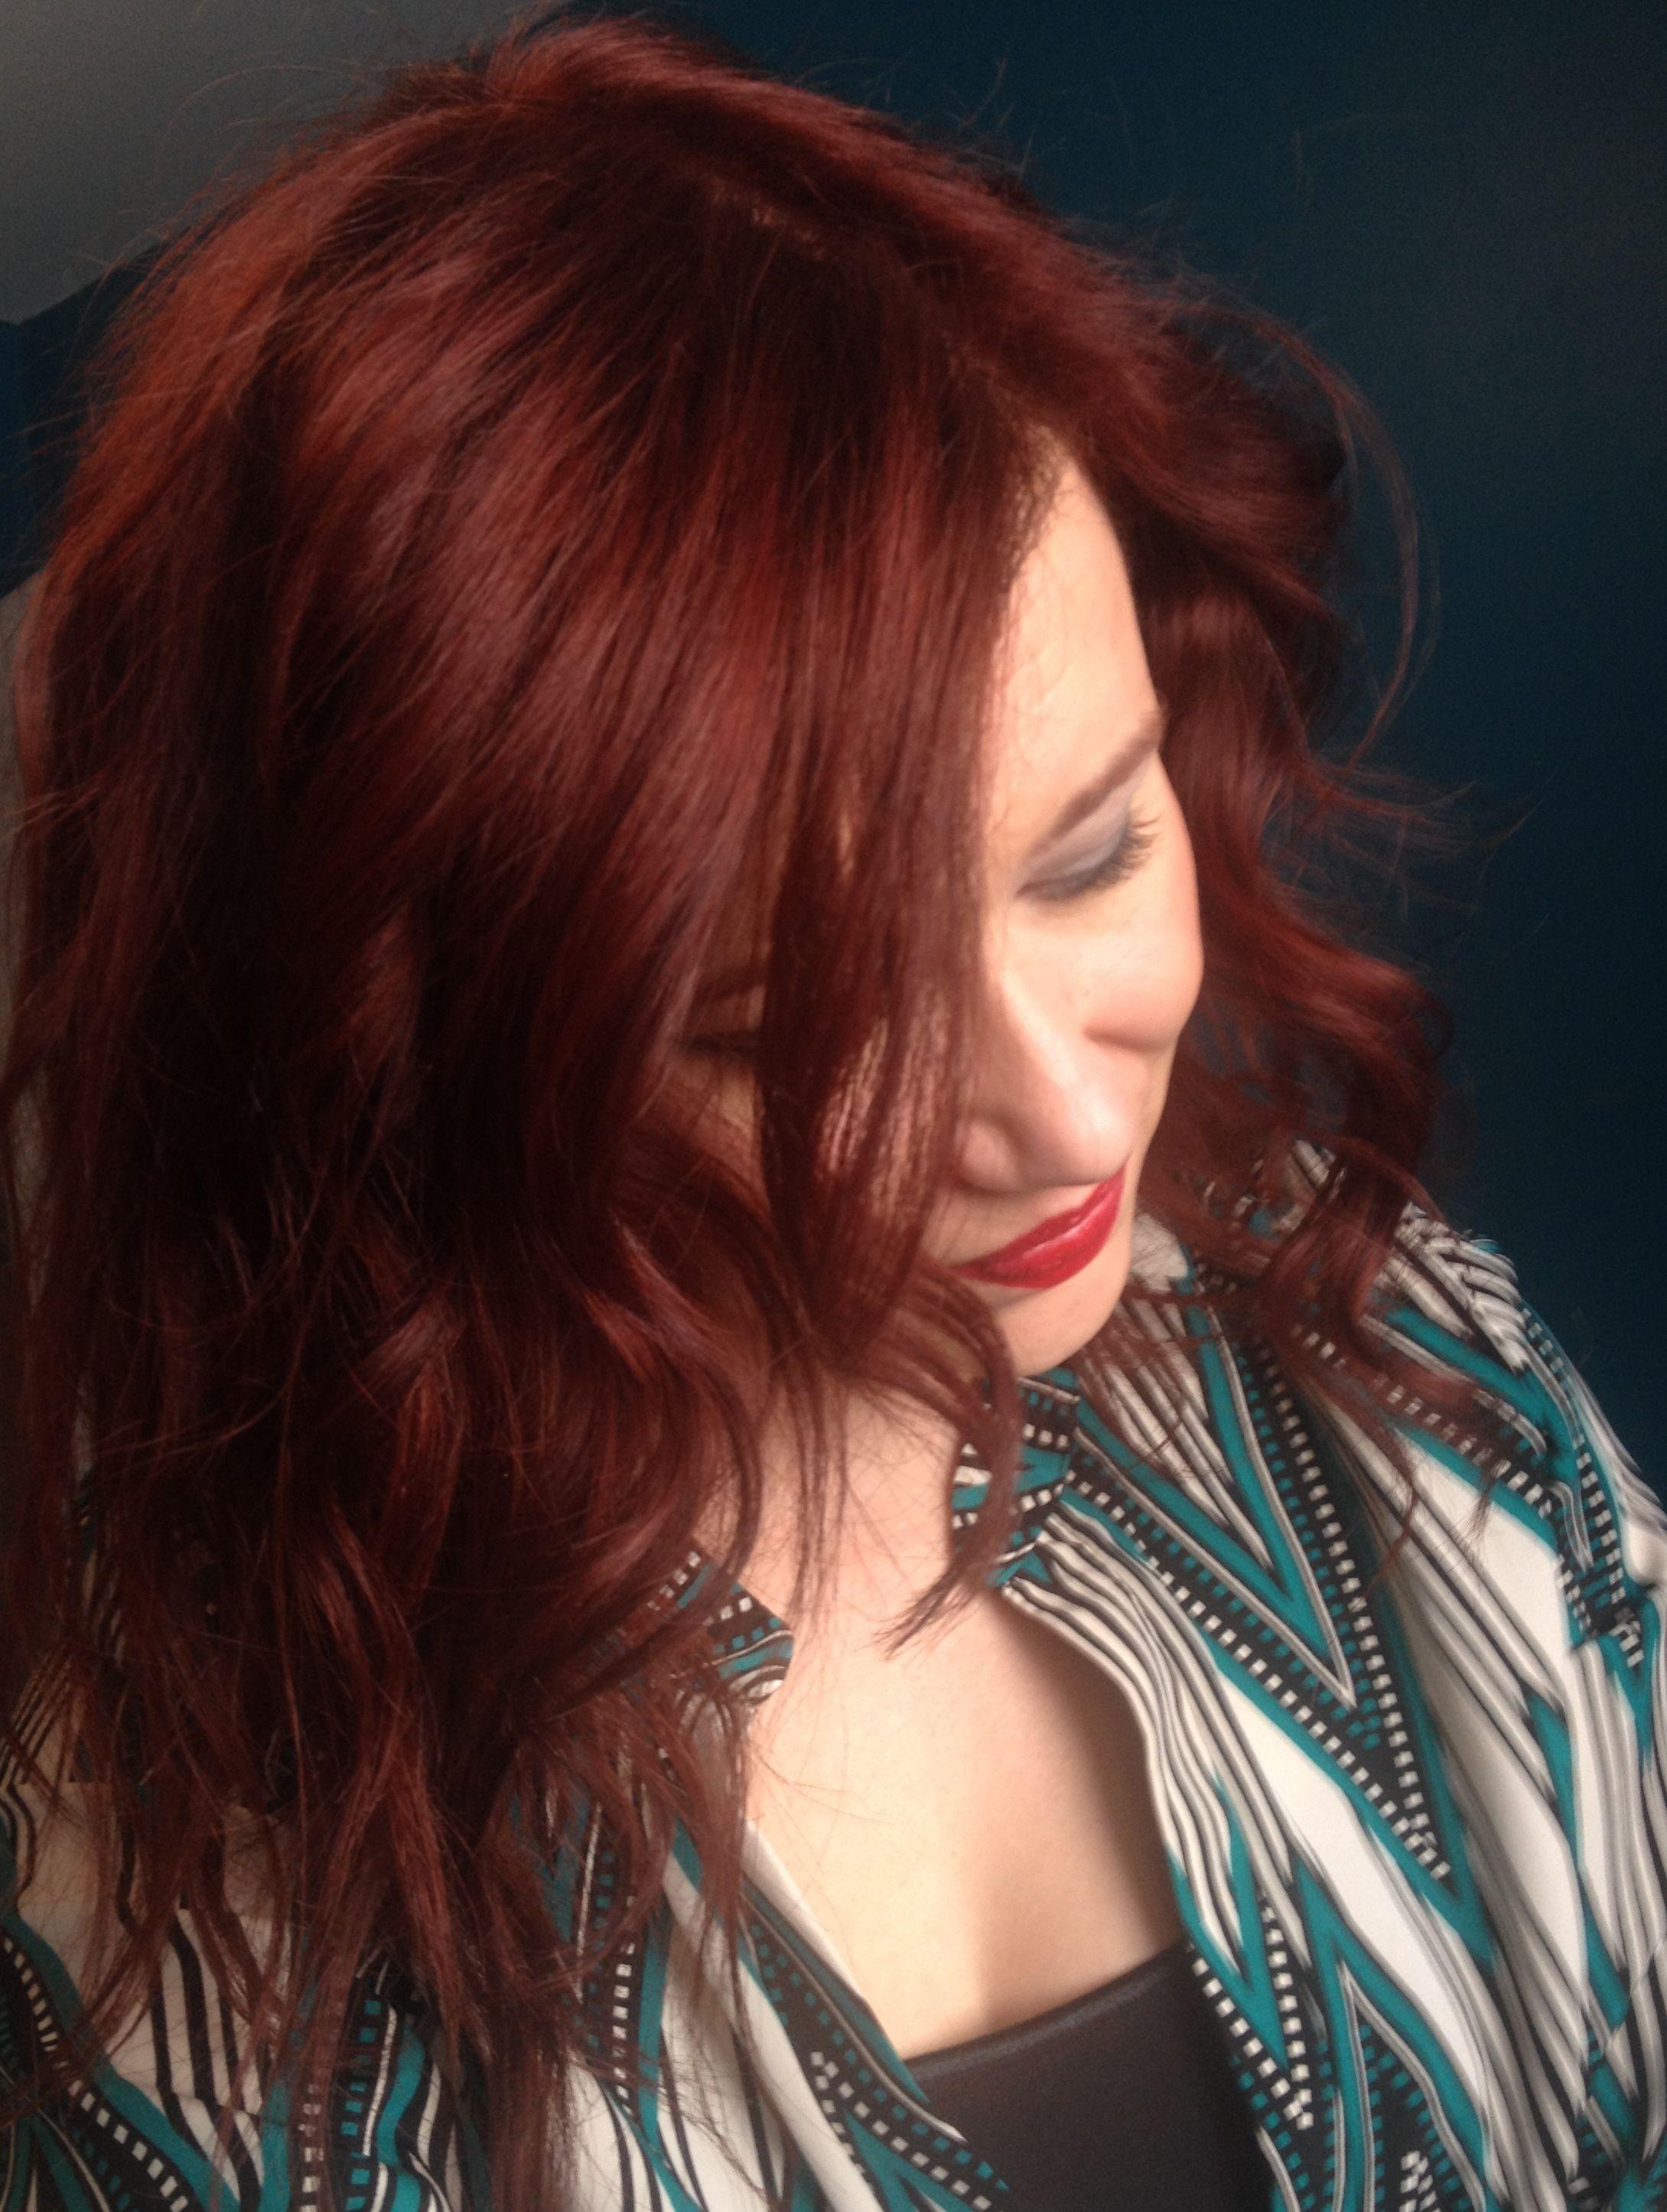 Wella Color Charm Gel Red 7R Red Hair Dye Dark Brown To Red